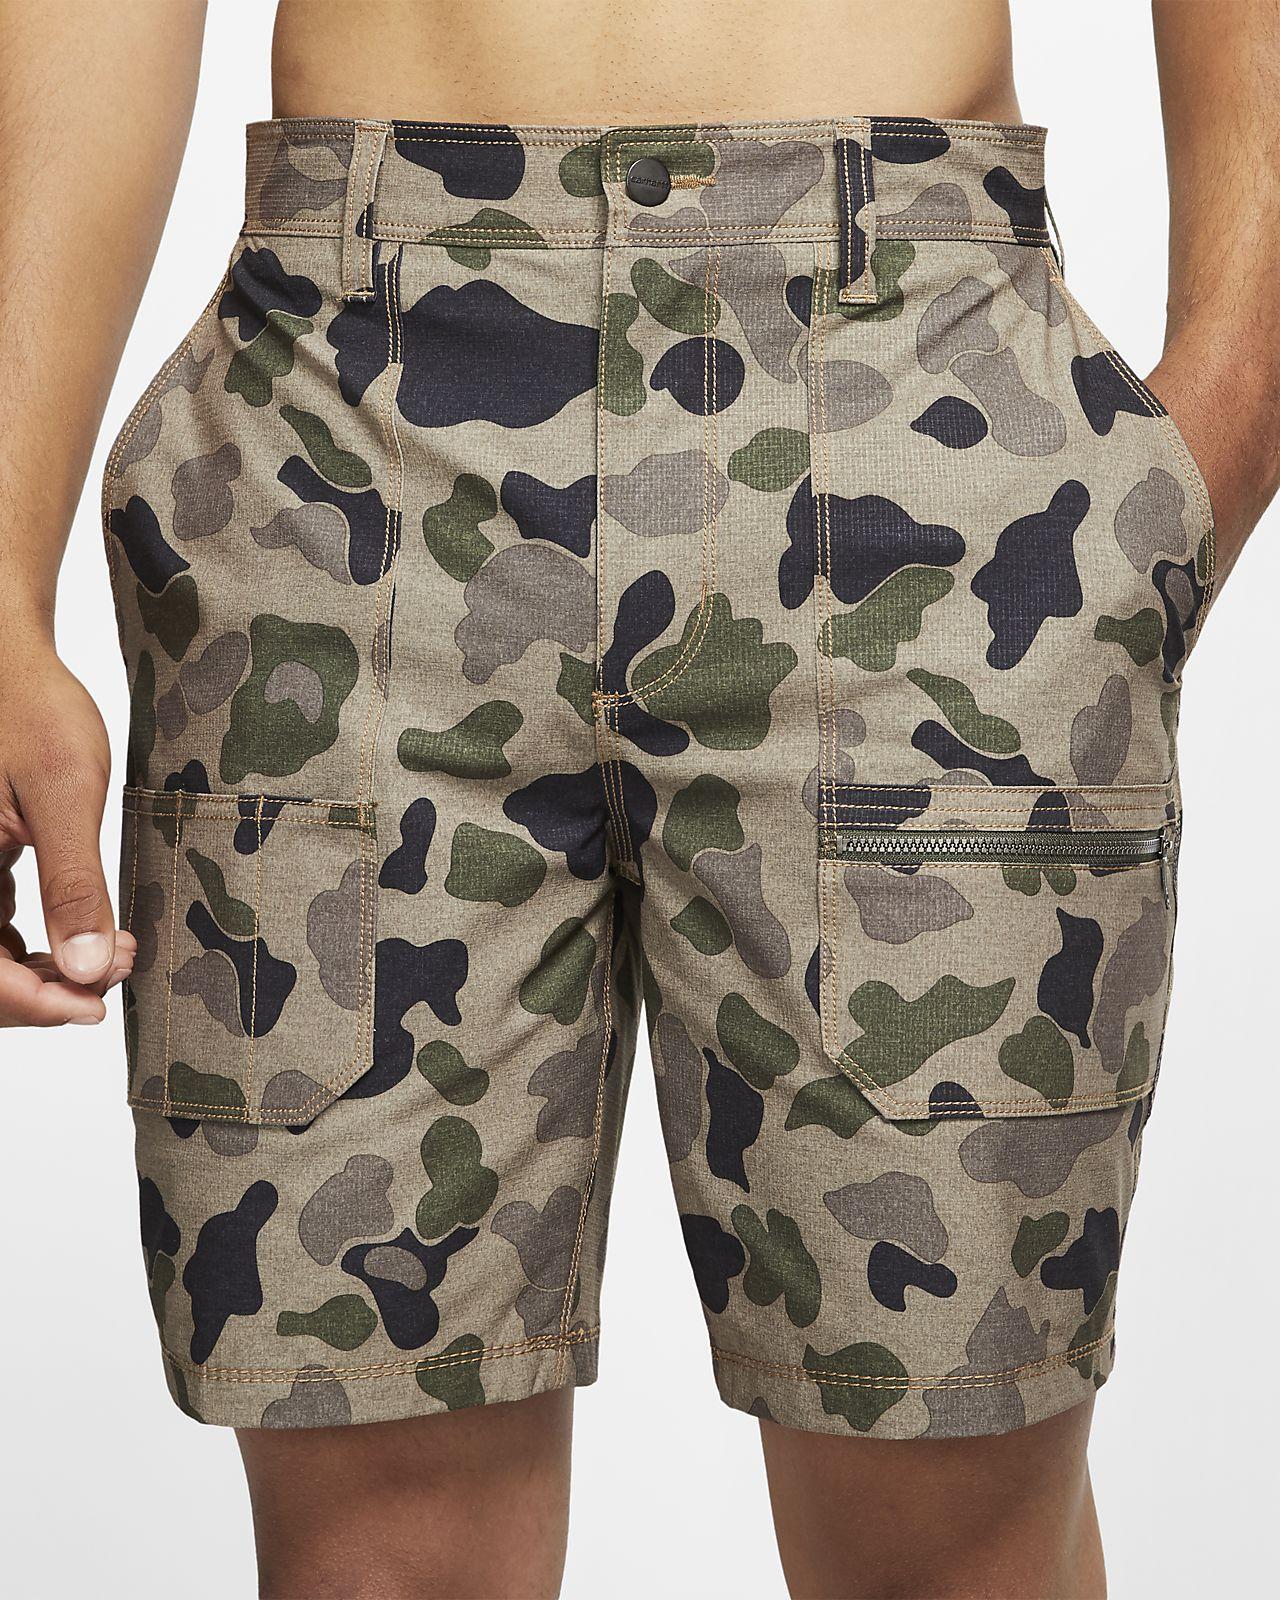 Hurley x Carhartt Camo-Work-Shorts für Herren (ca. 48,5 cm)